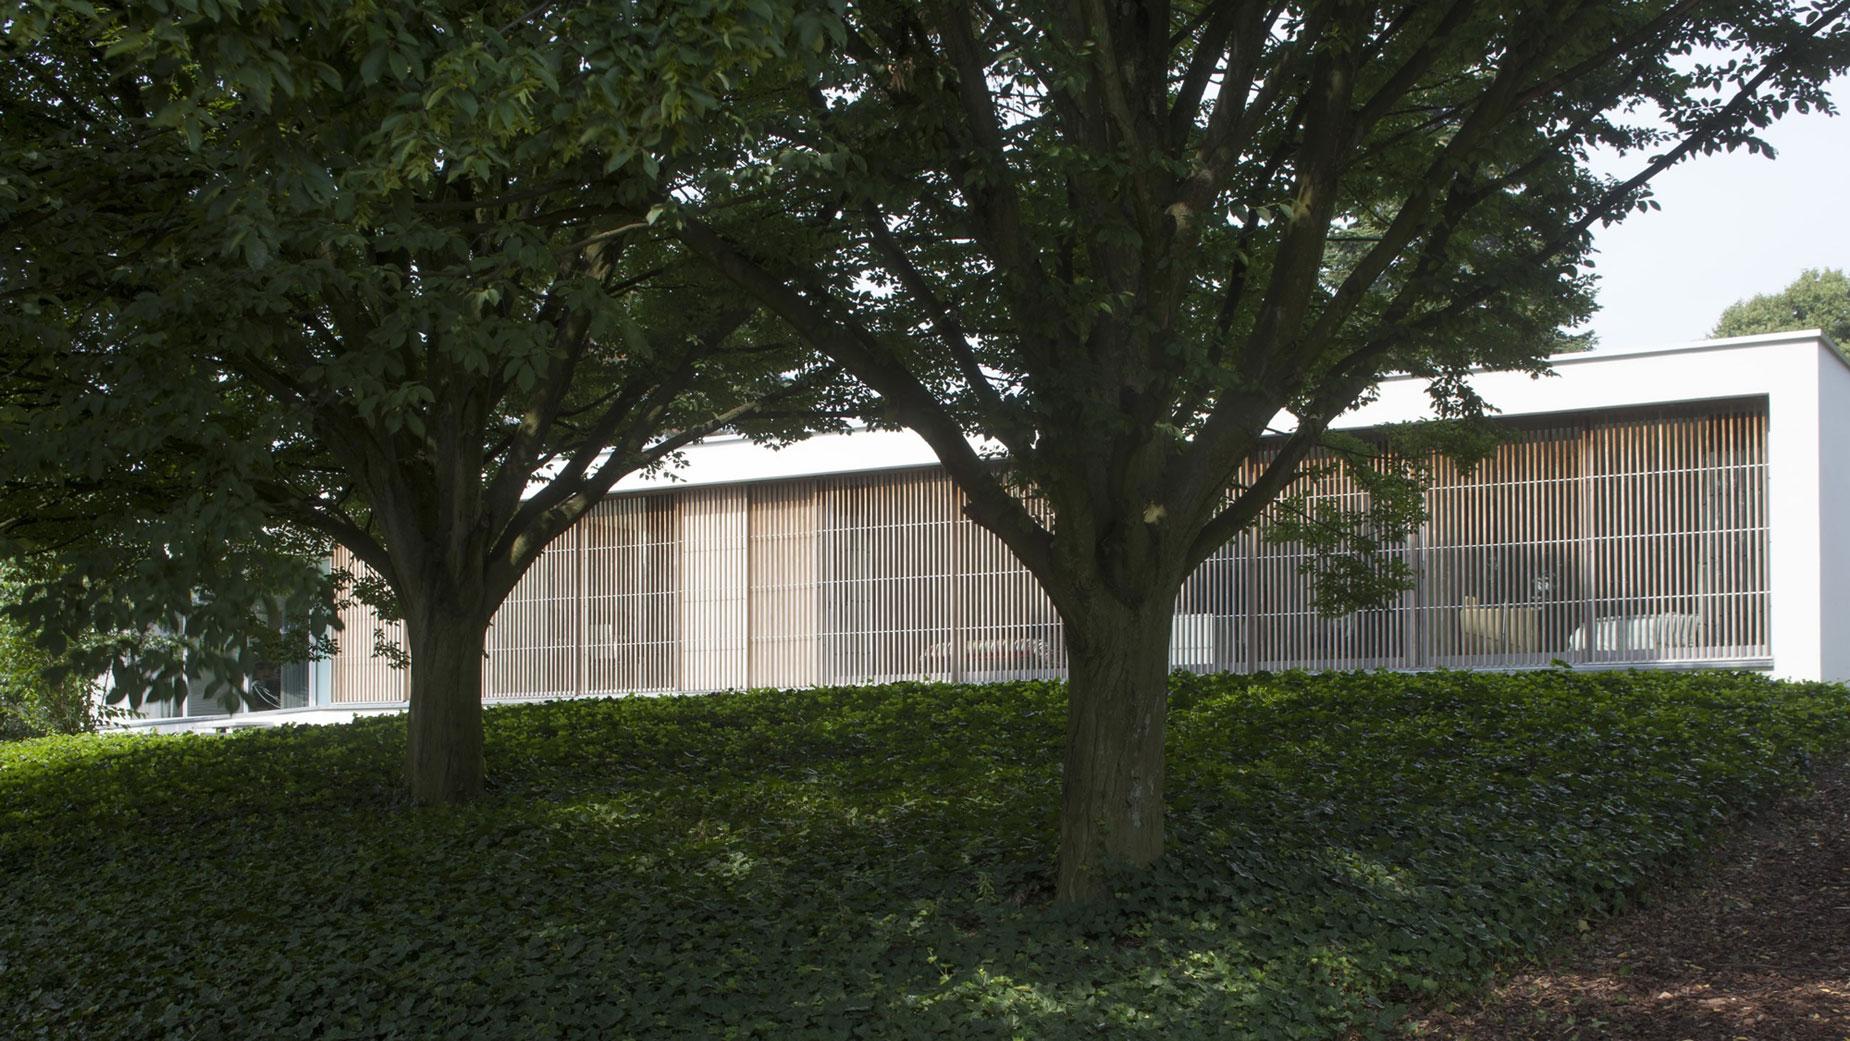 Boxed Villa Spee Haelen with Panoramic Windows by Lab32 architecten-05